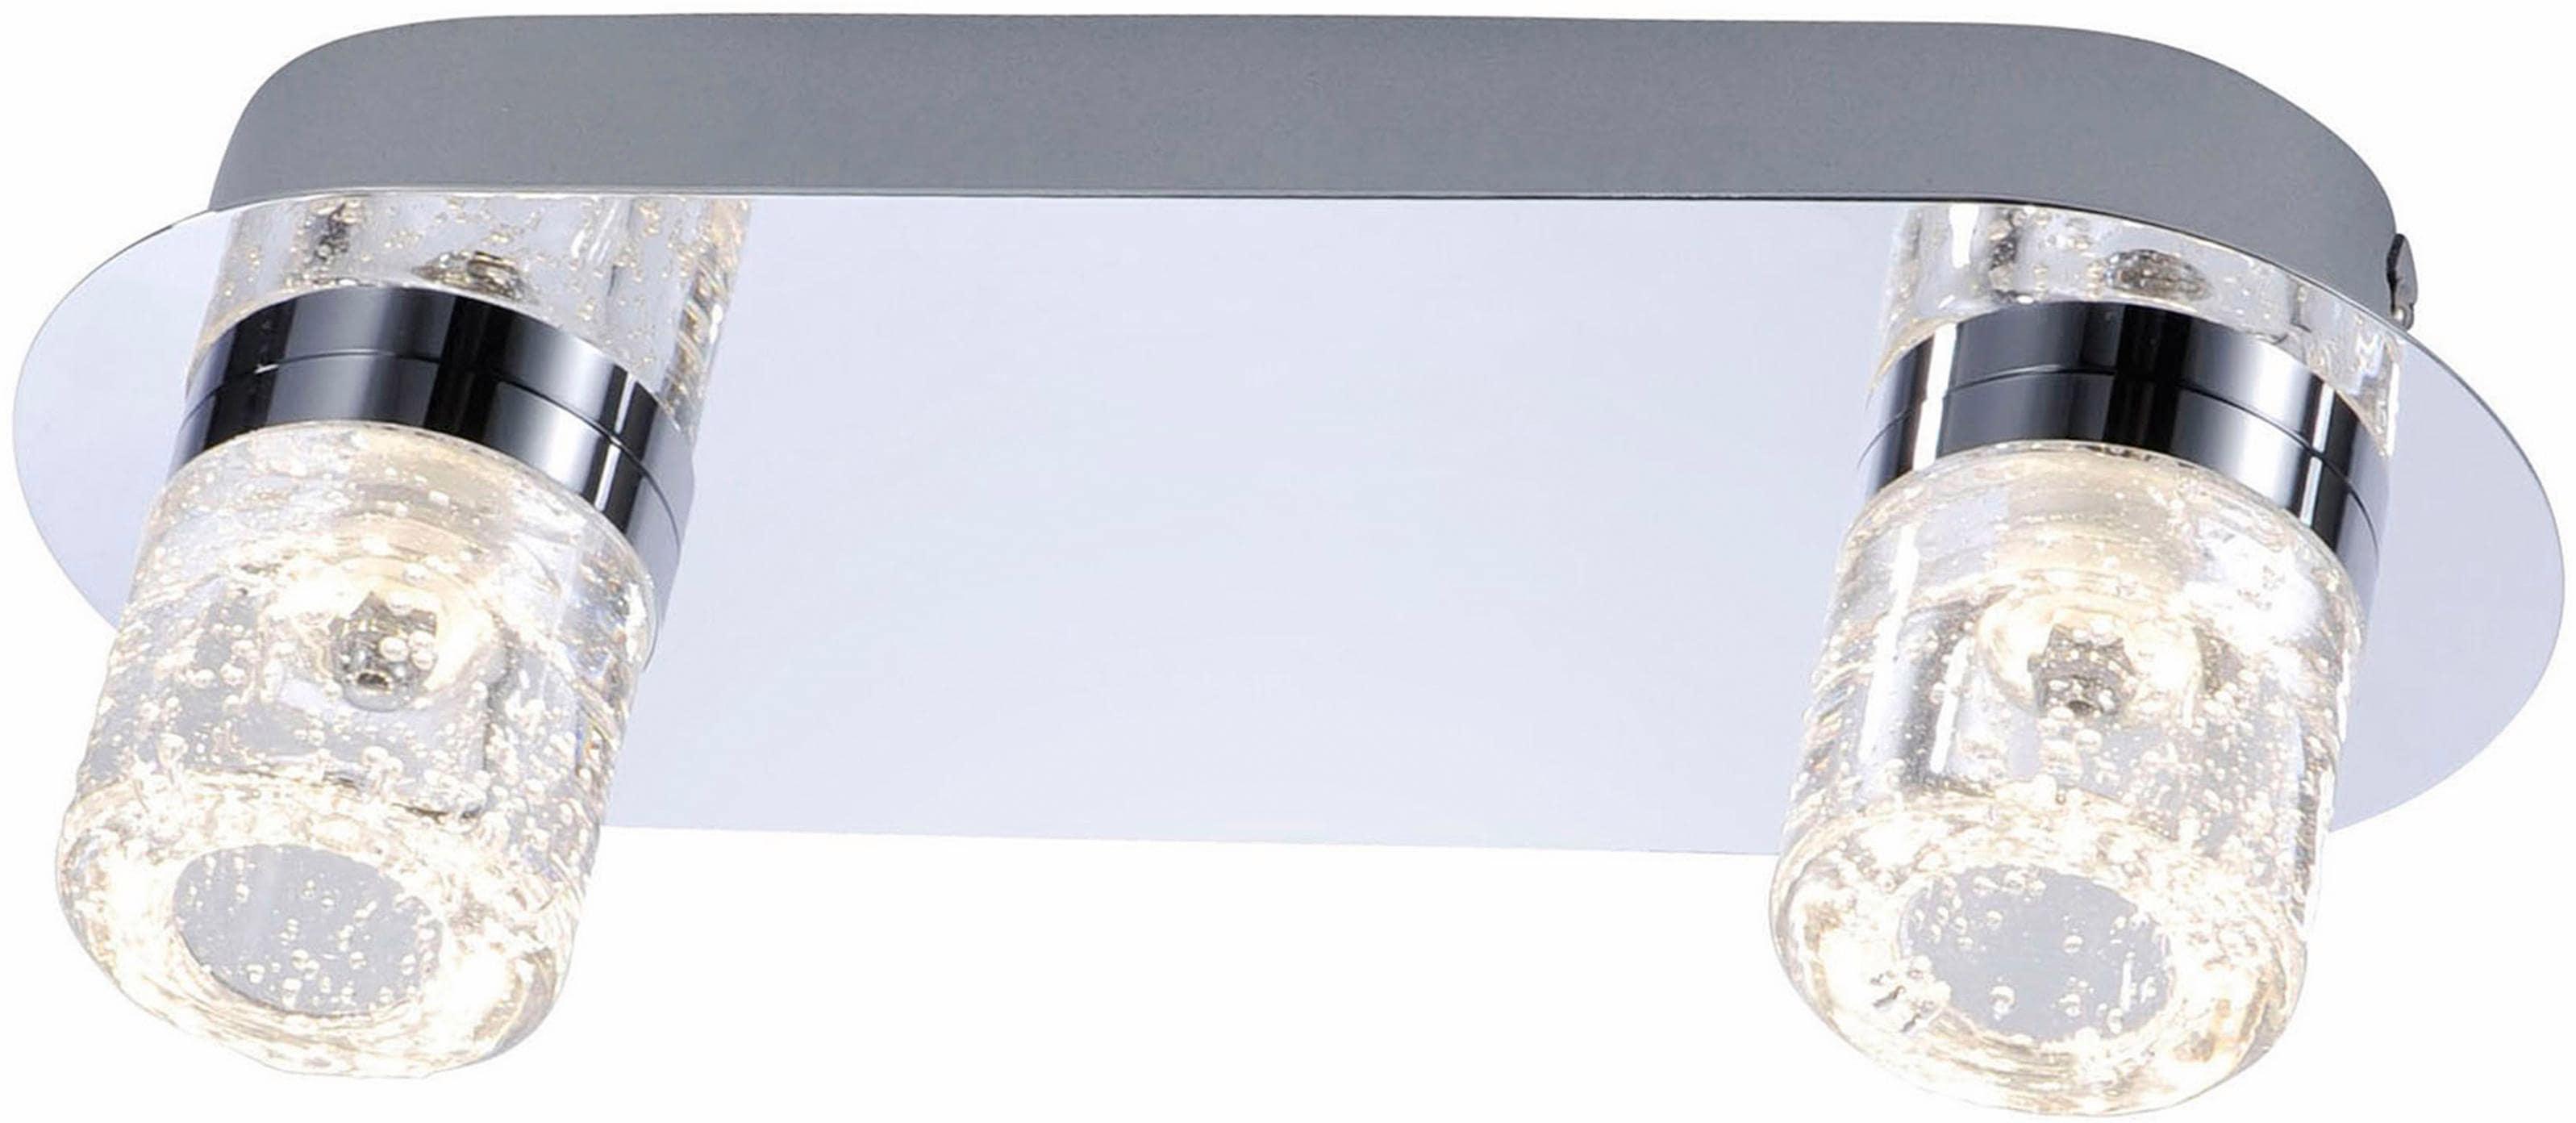 Paul Neuhaus LED Deckenleuchte BILAN